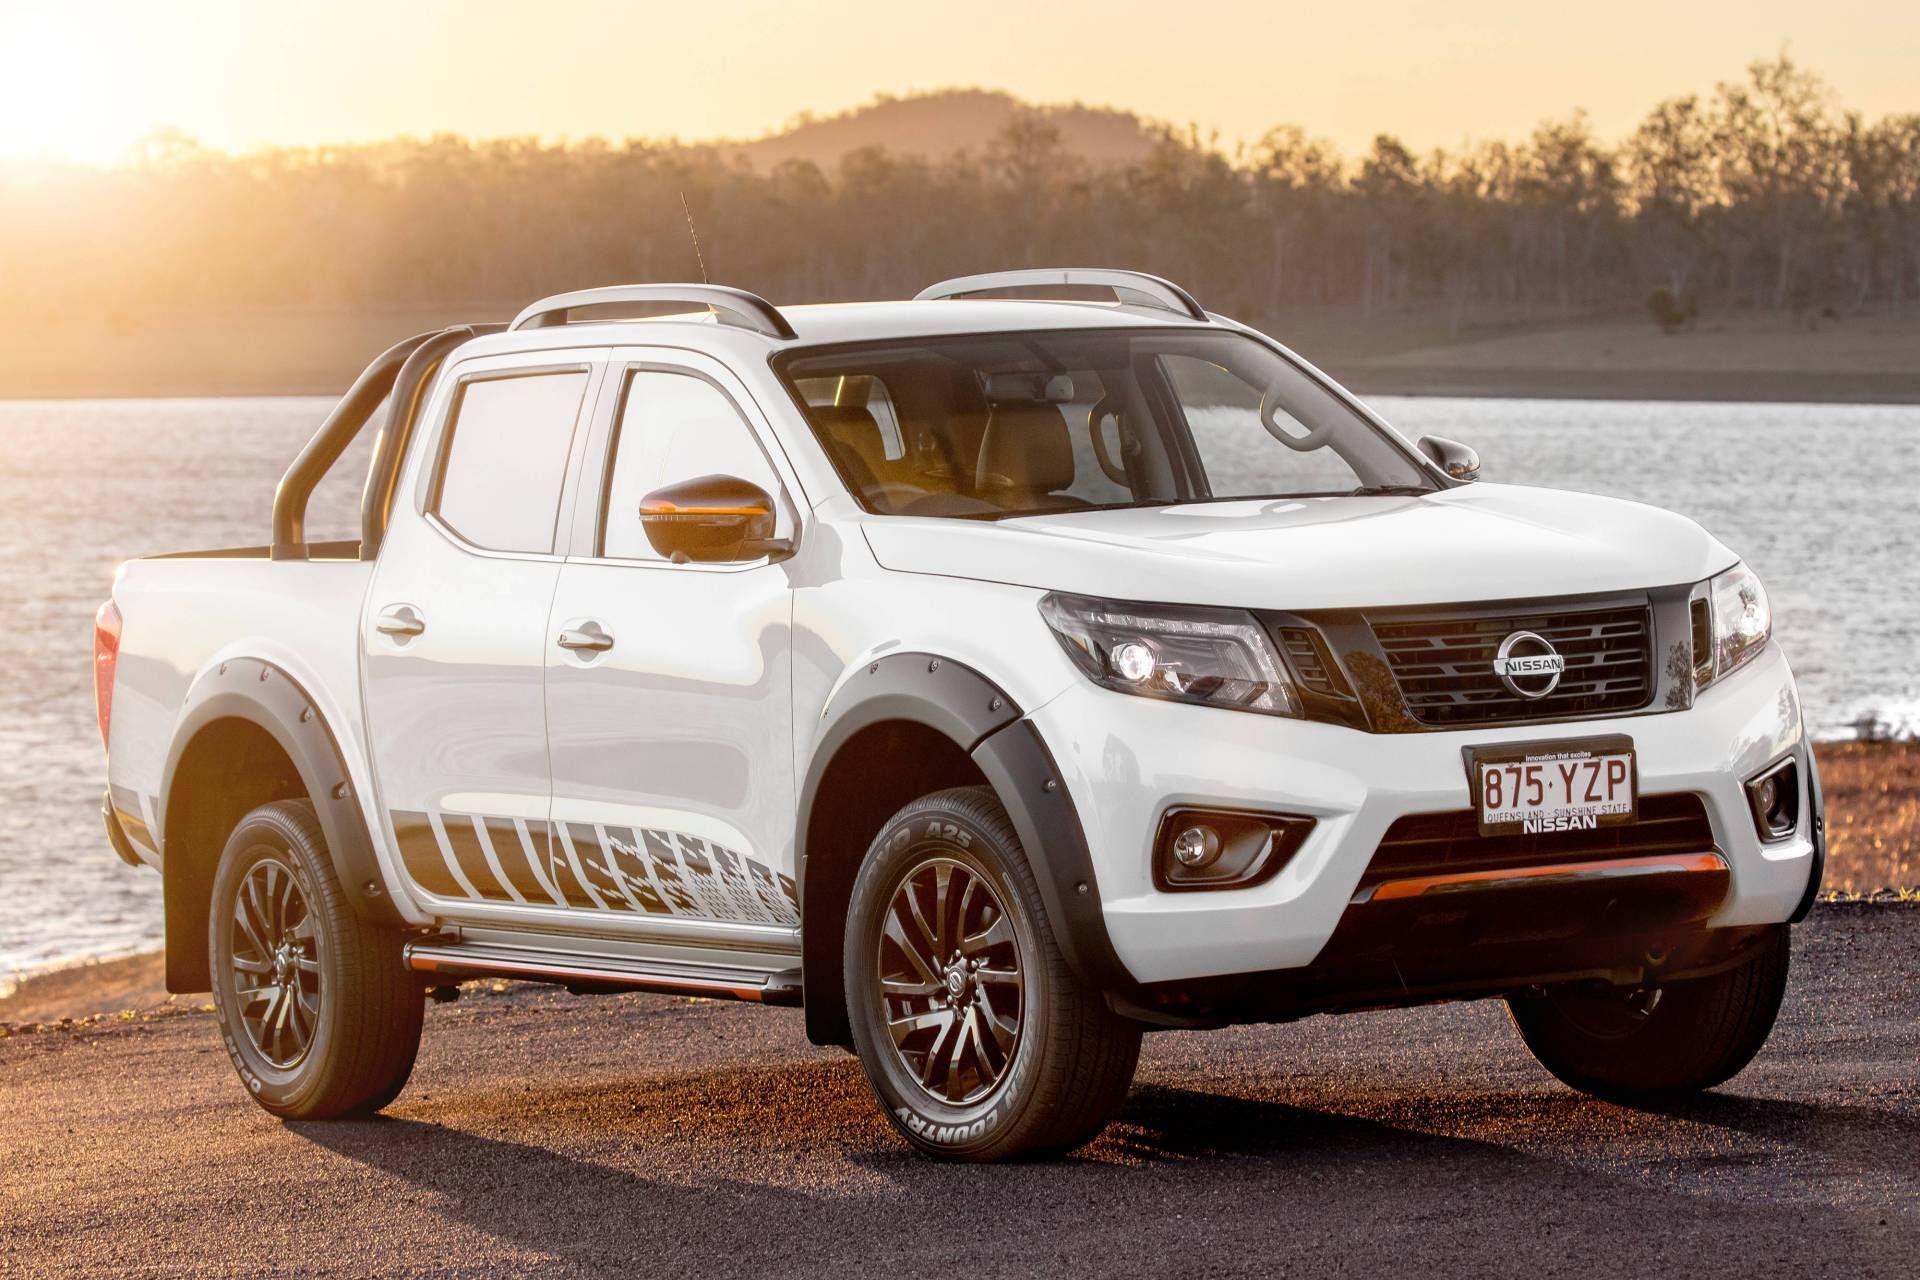 2020 Nissan Navara Rumors Redesign Release Date Nissan Navara Nissan Nissan Suvs